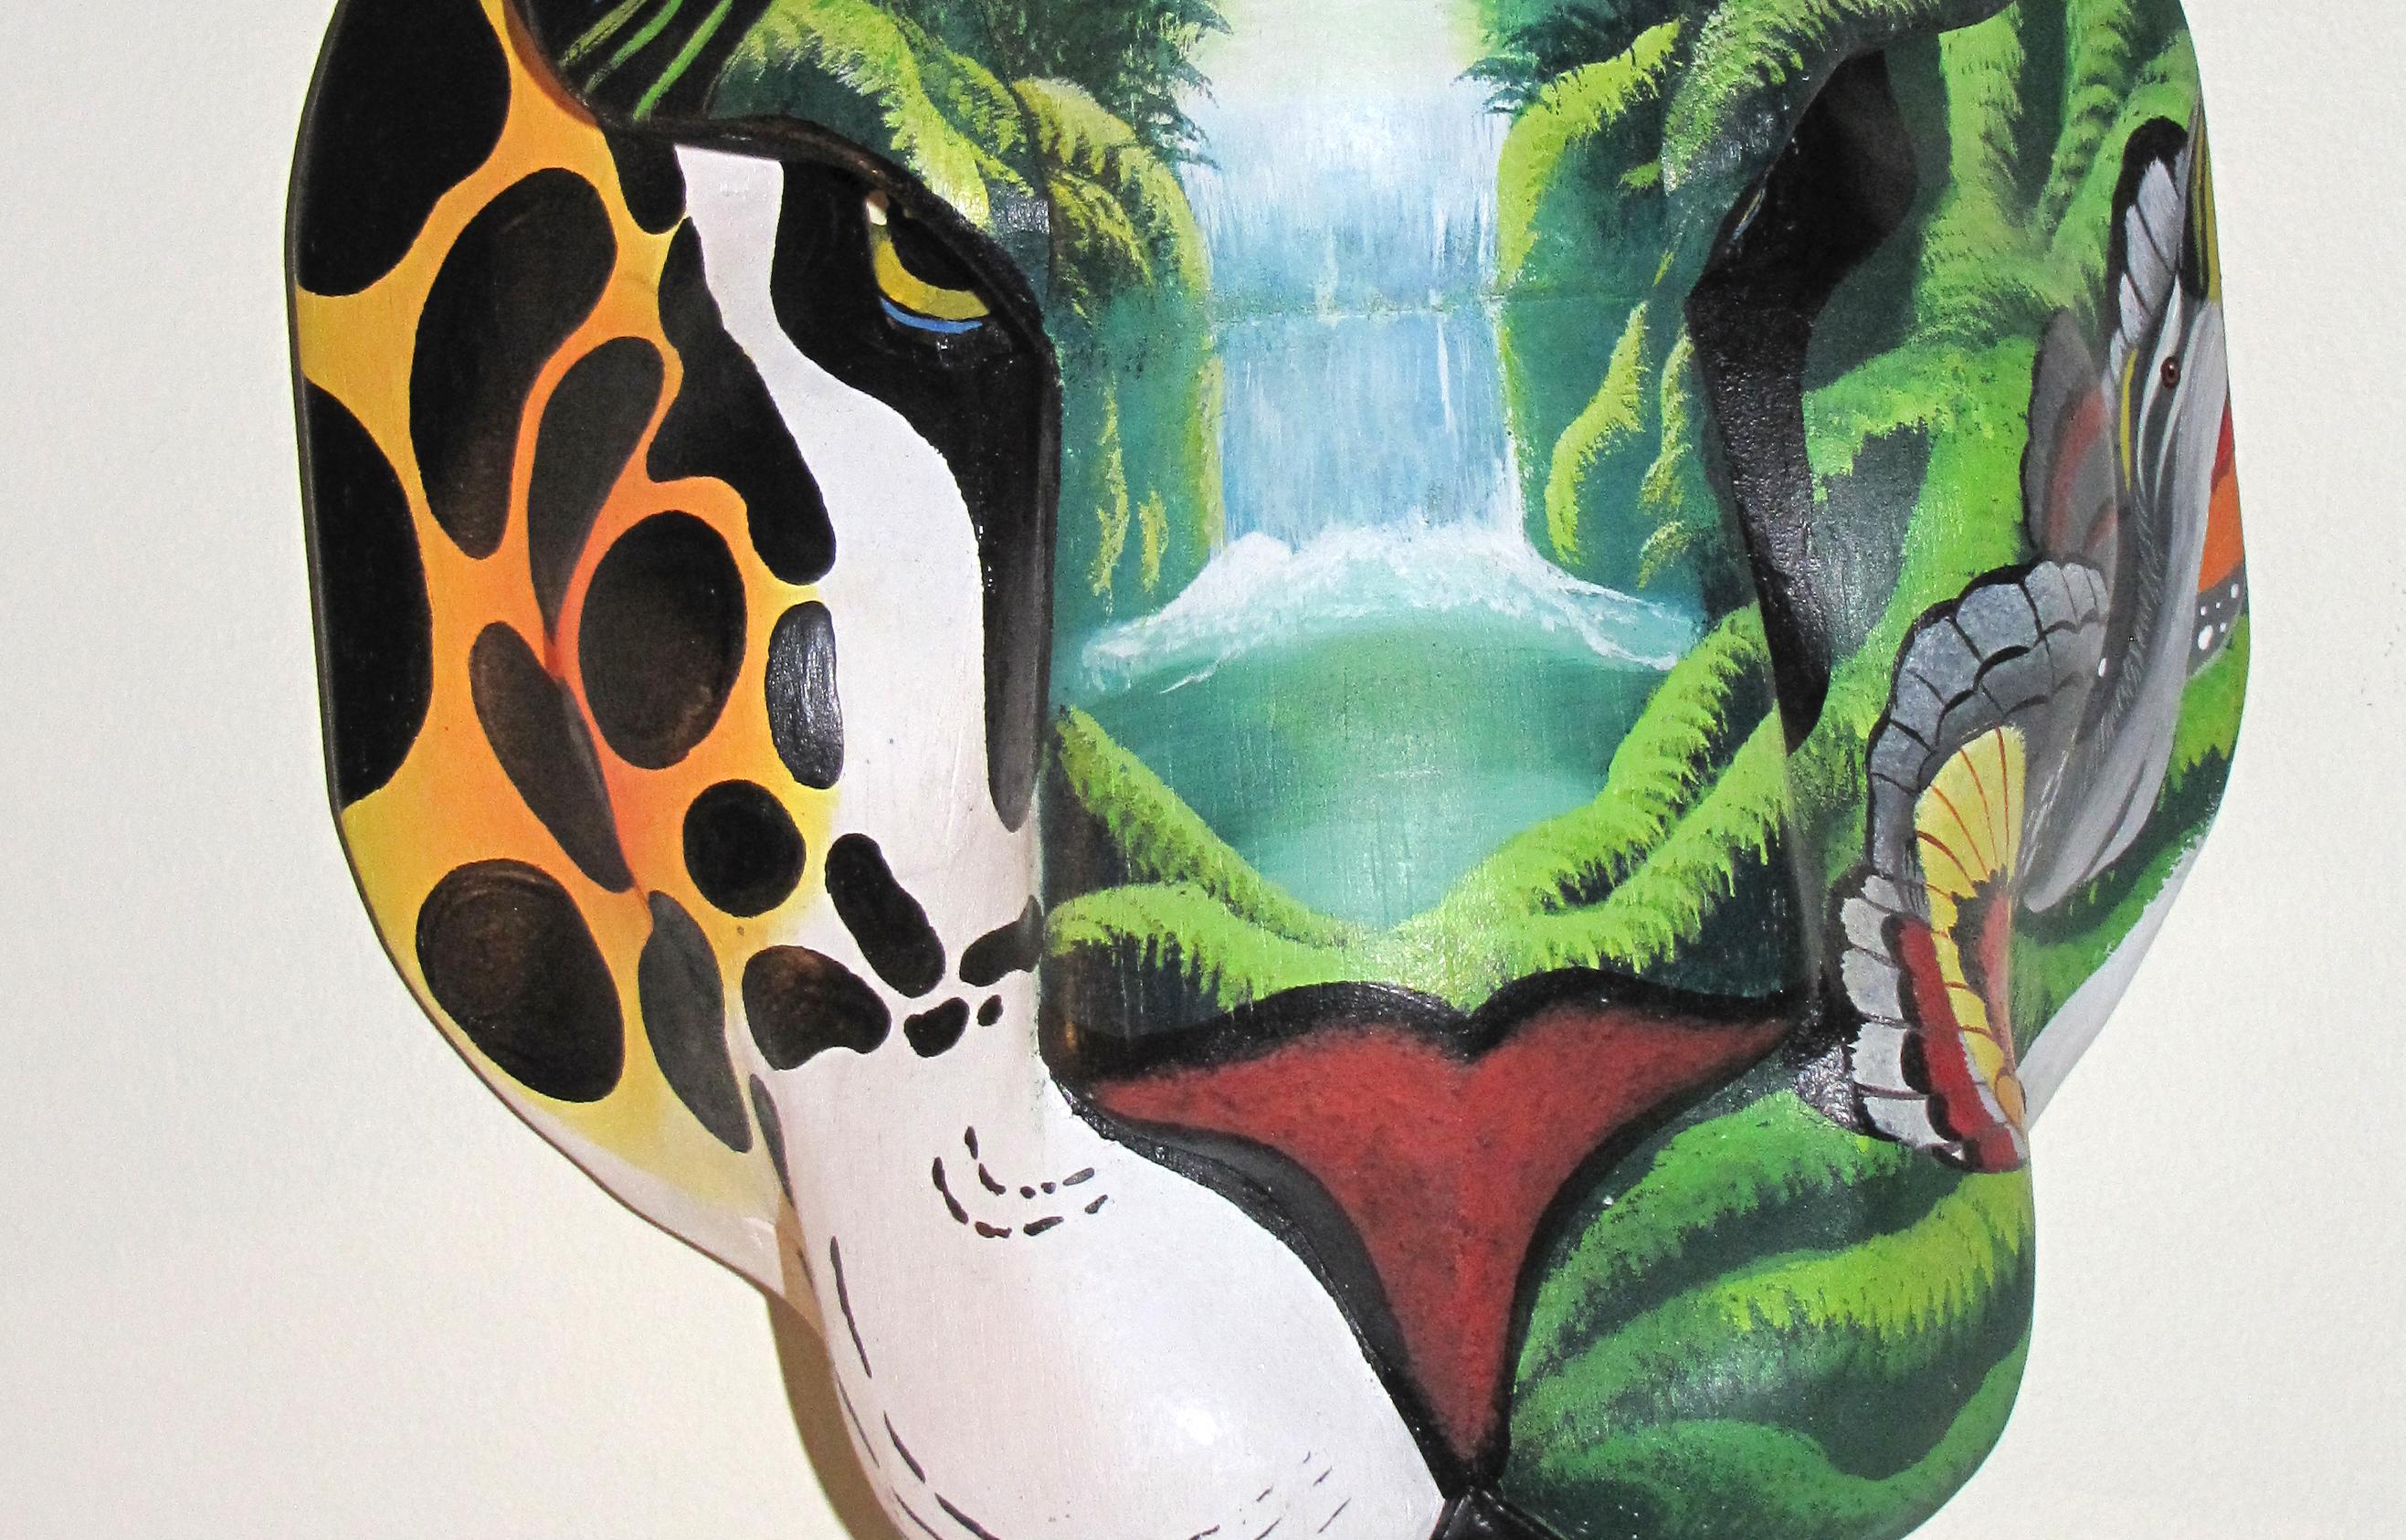 Boruca mask at exhibit